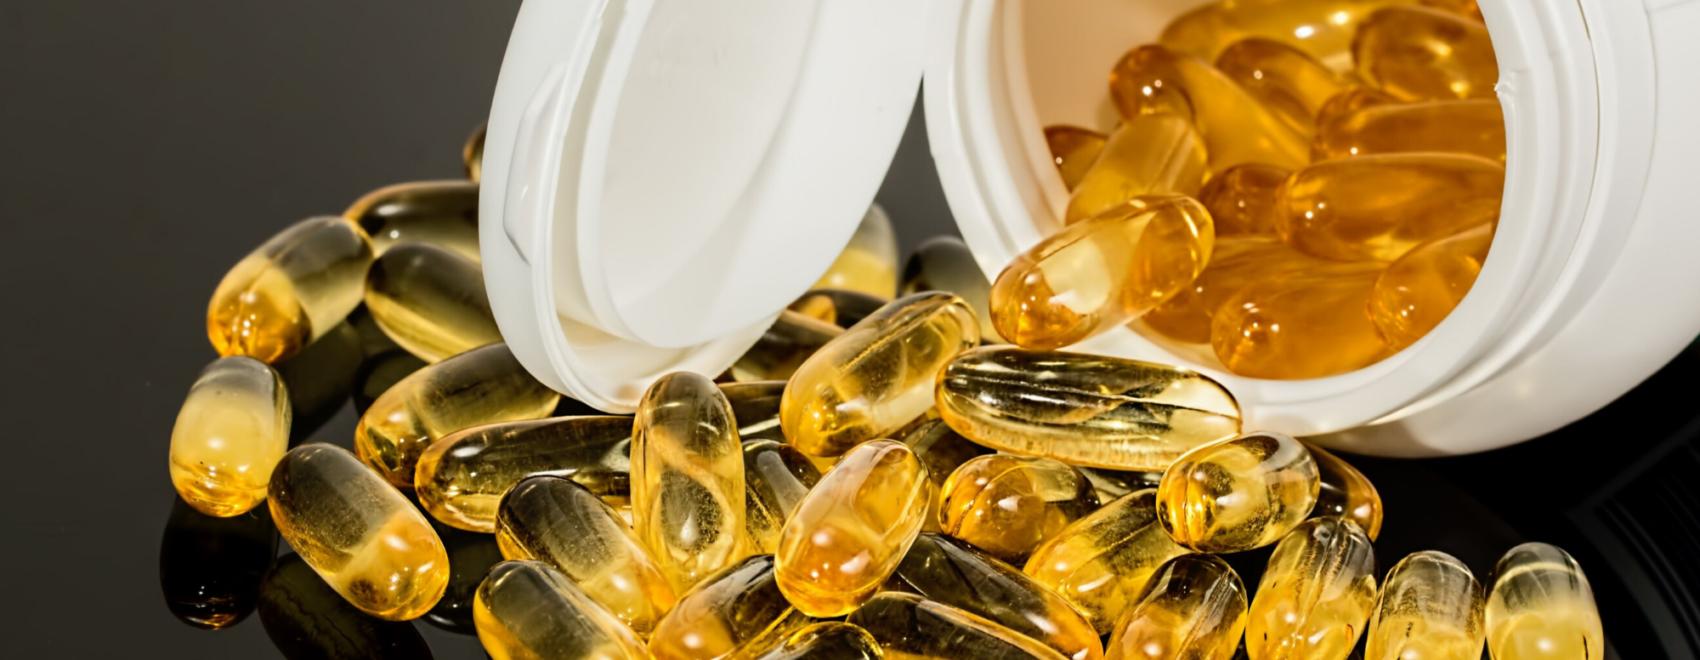 JayLab Pro Nutrition Supplements